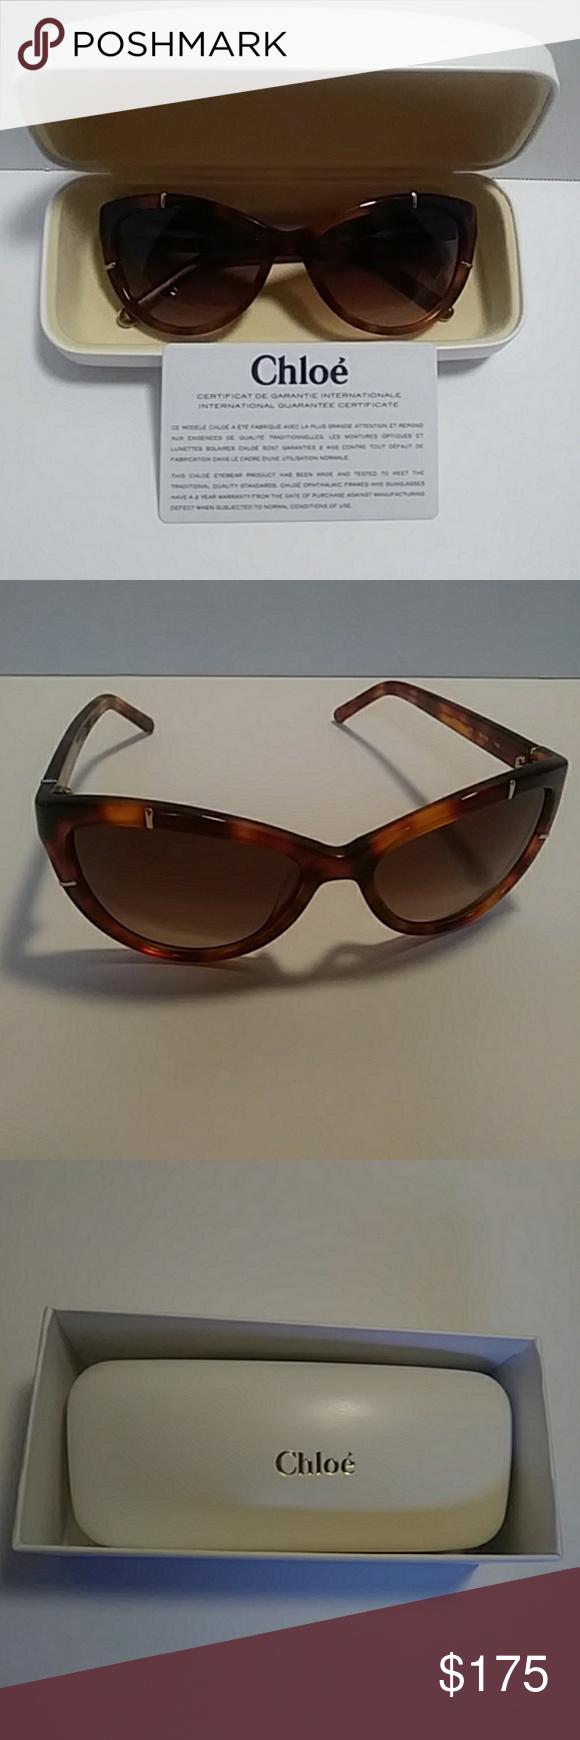 CHLOE Cat Eye Sunglasses Light Havana Cat eye sunglasses